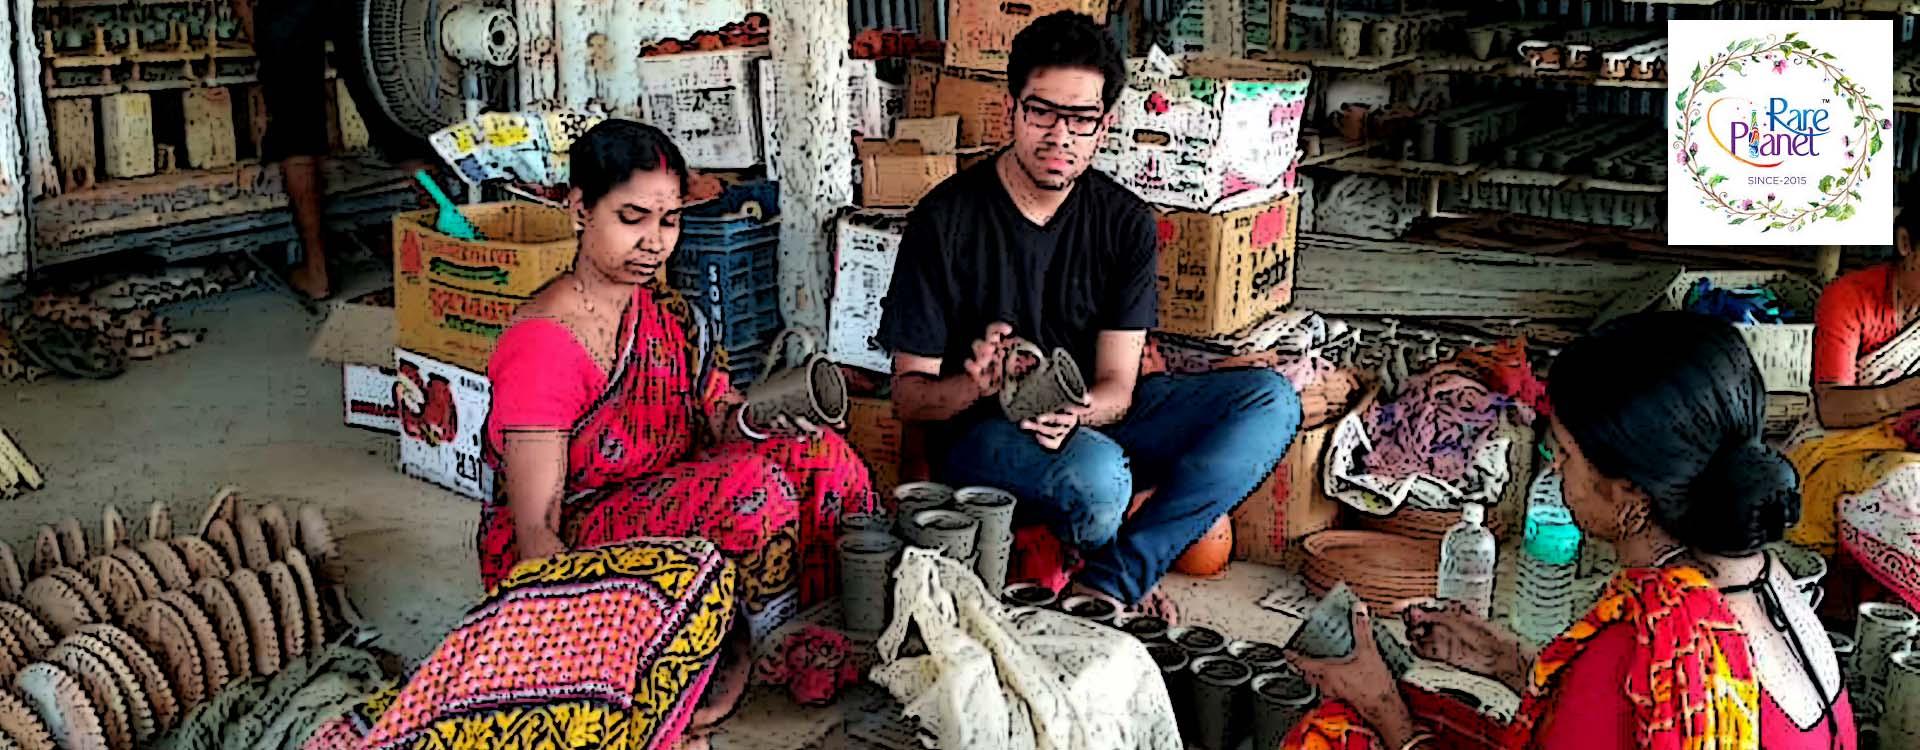 Rare Planet promoting Indian Handicrafts